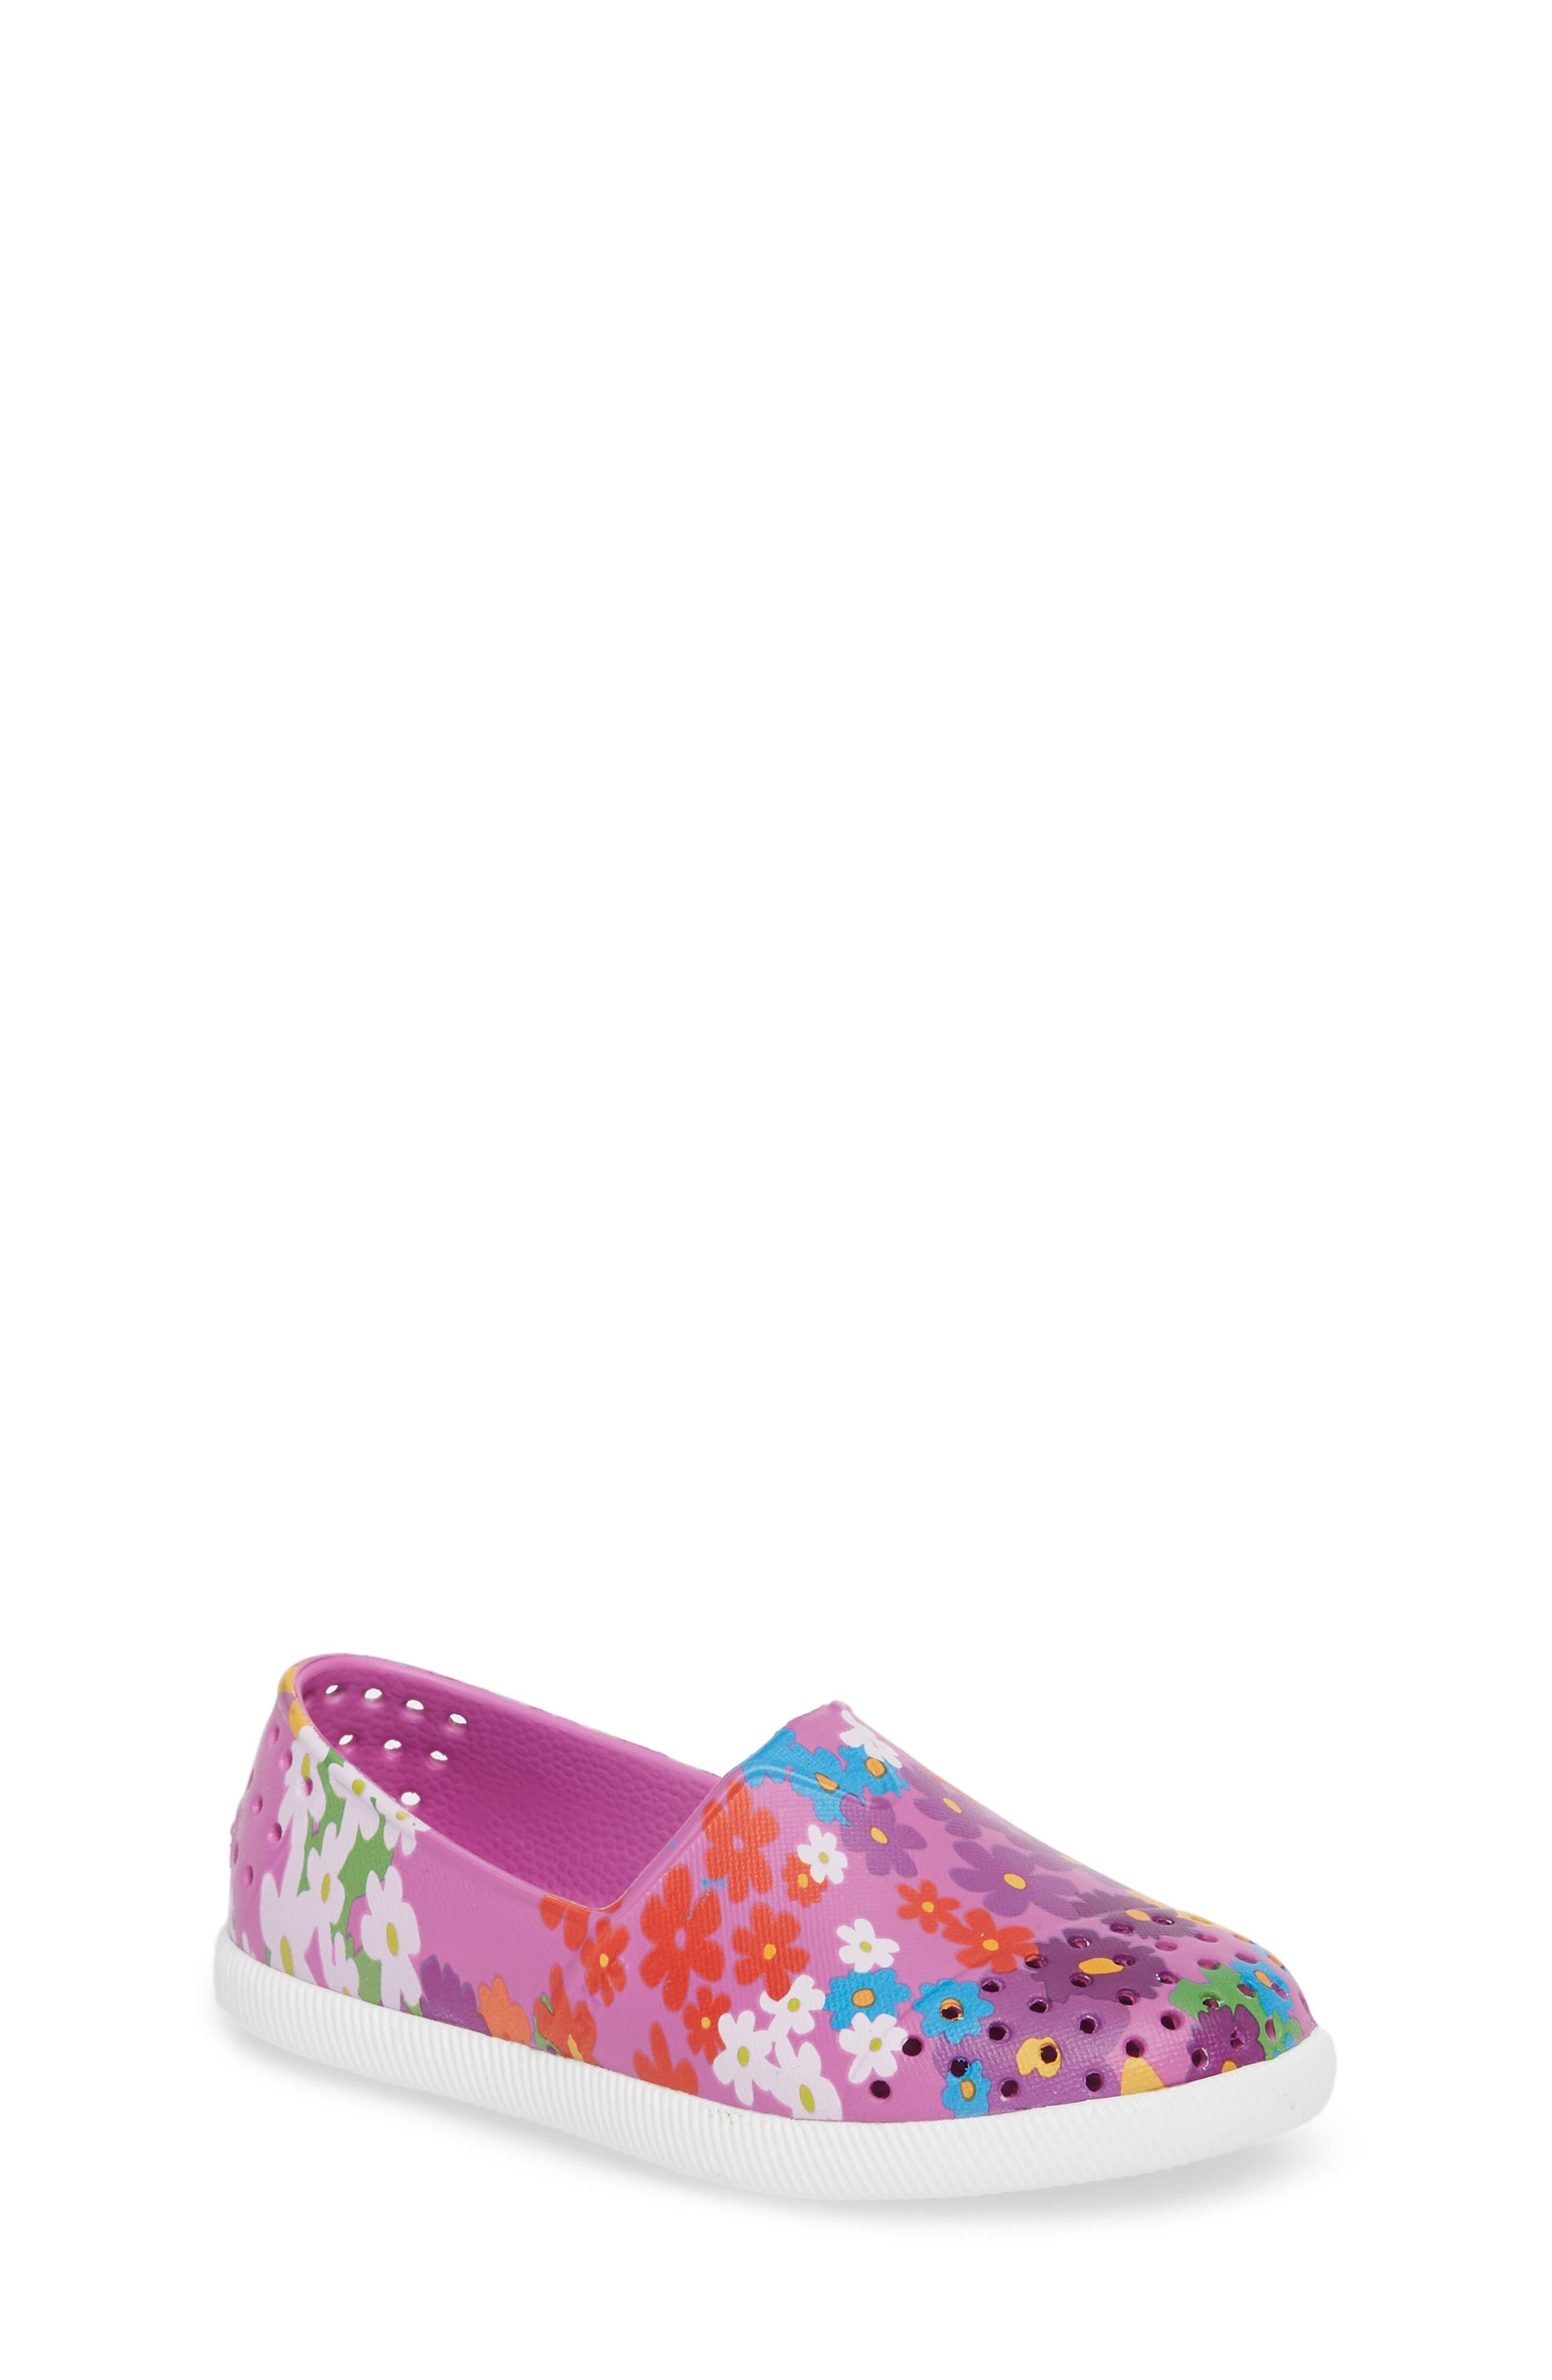 Verona Perforated Slip-On,                         Main,                         color, Peace Purple/ White/ Daisy